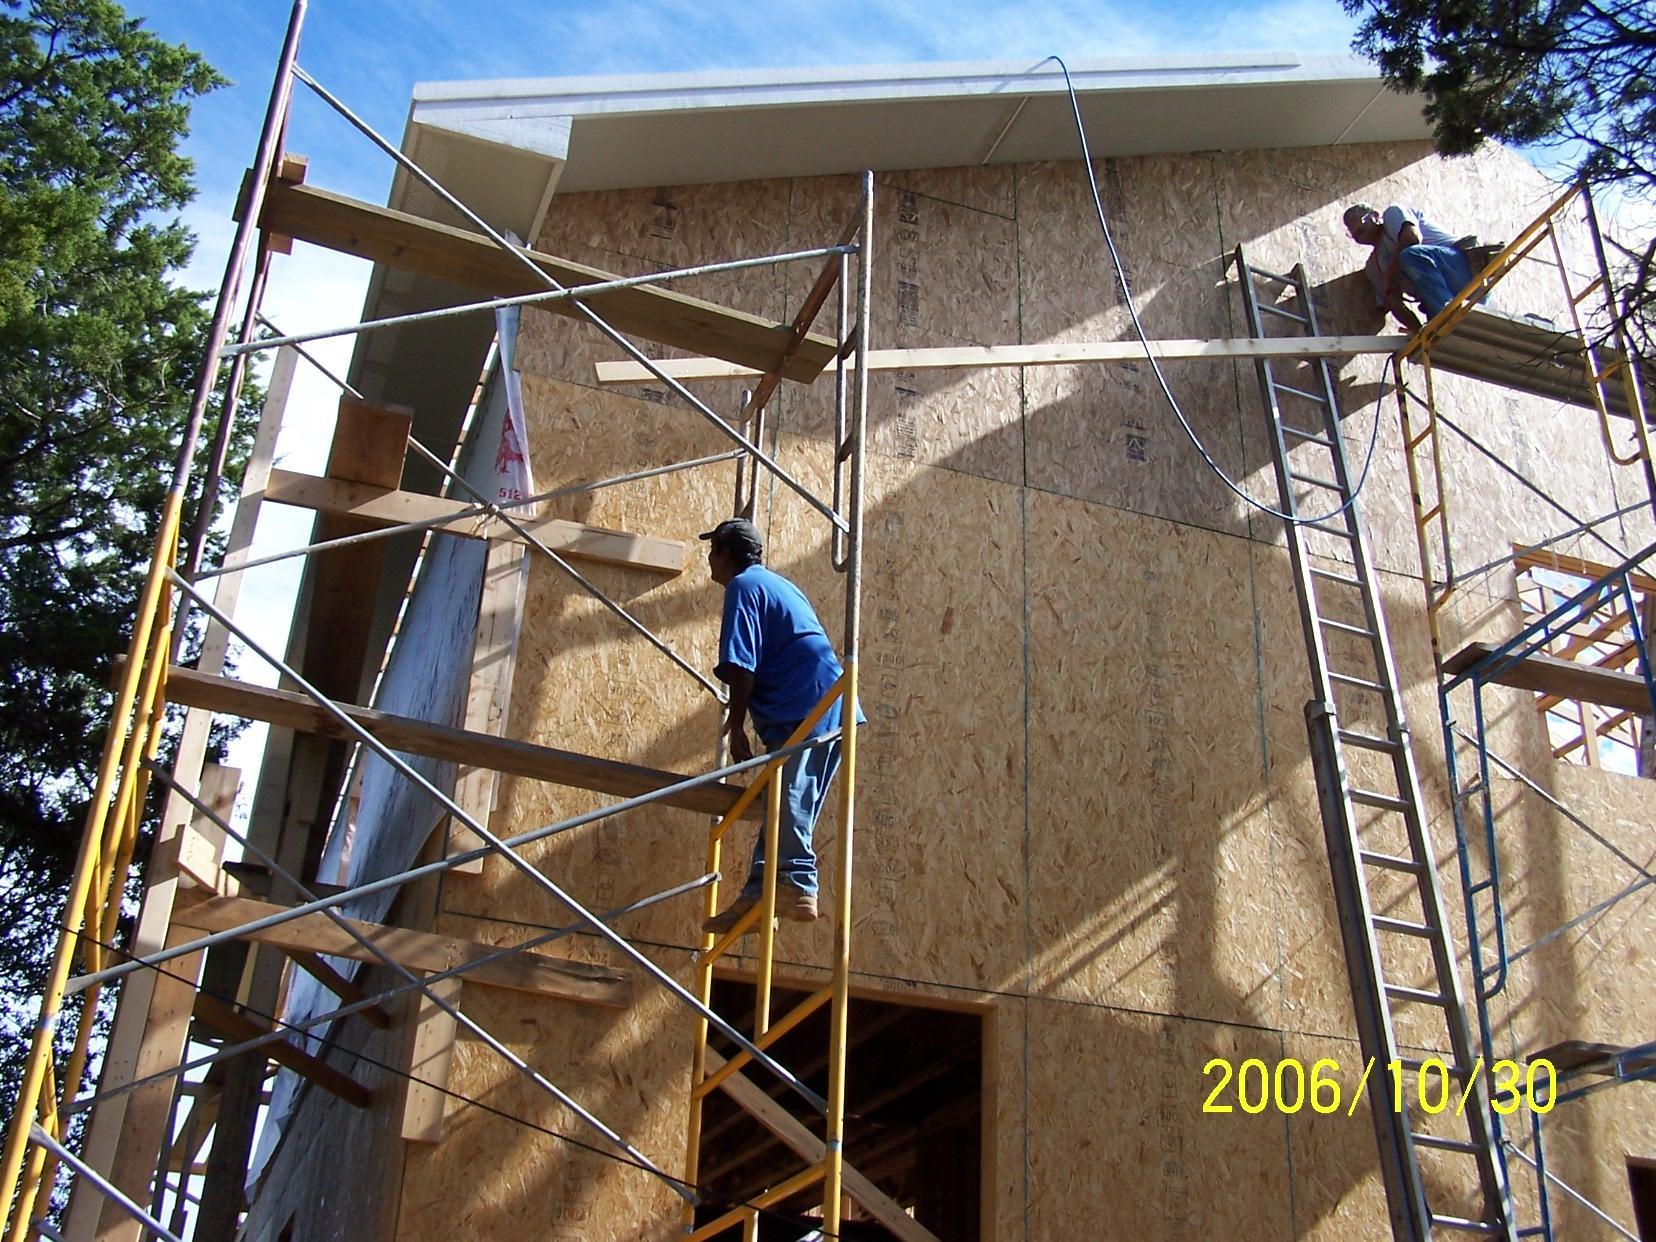 SEA Service Company LLC image 36